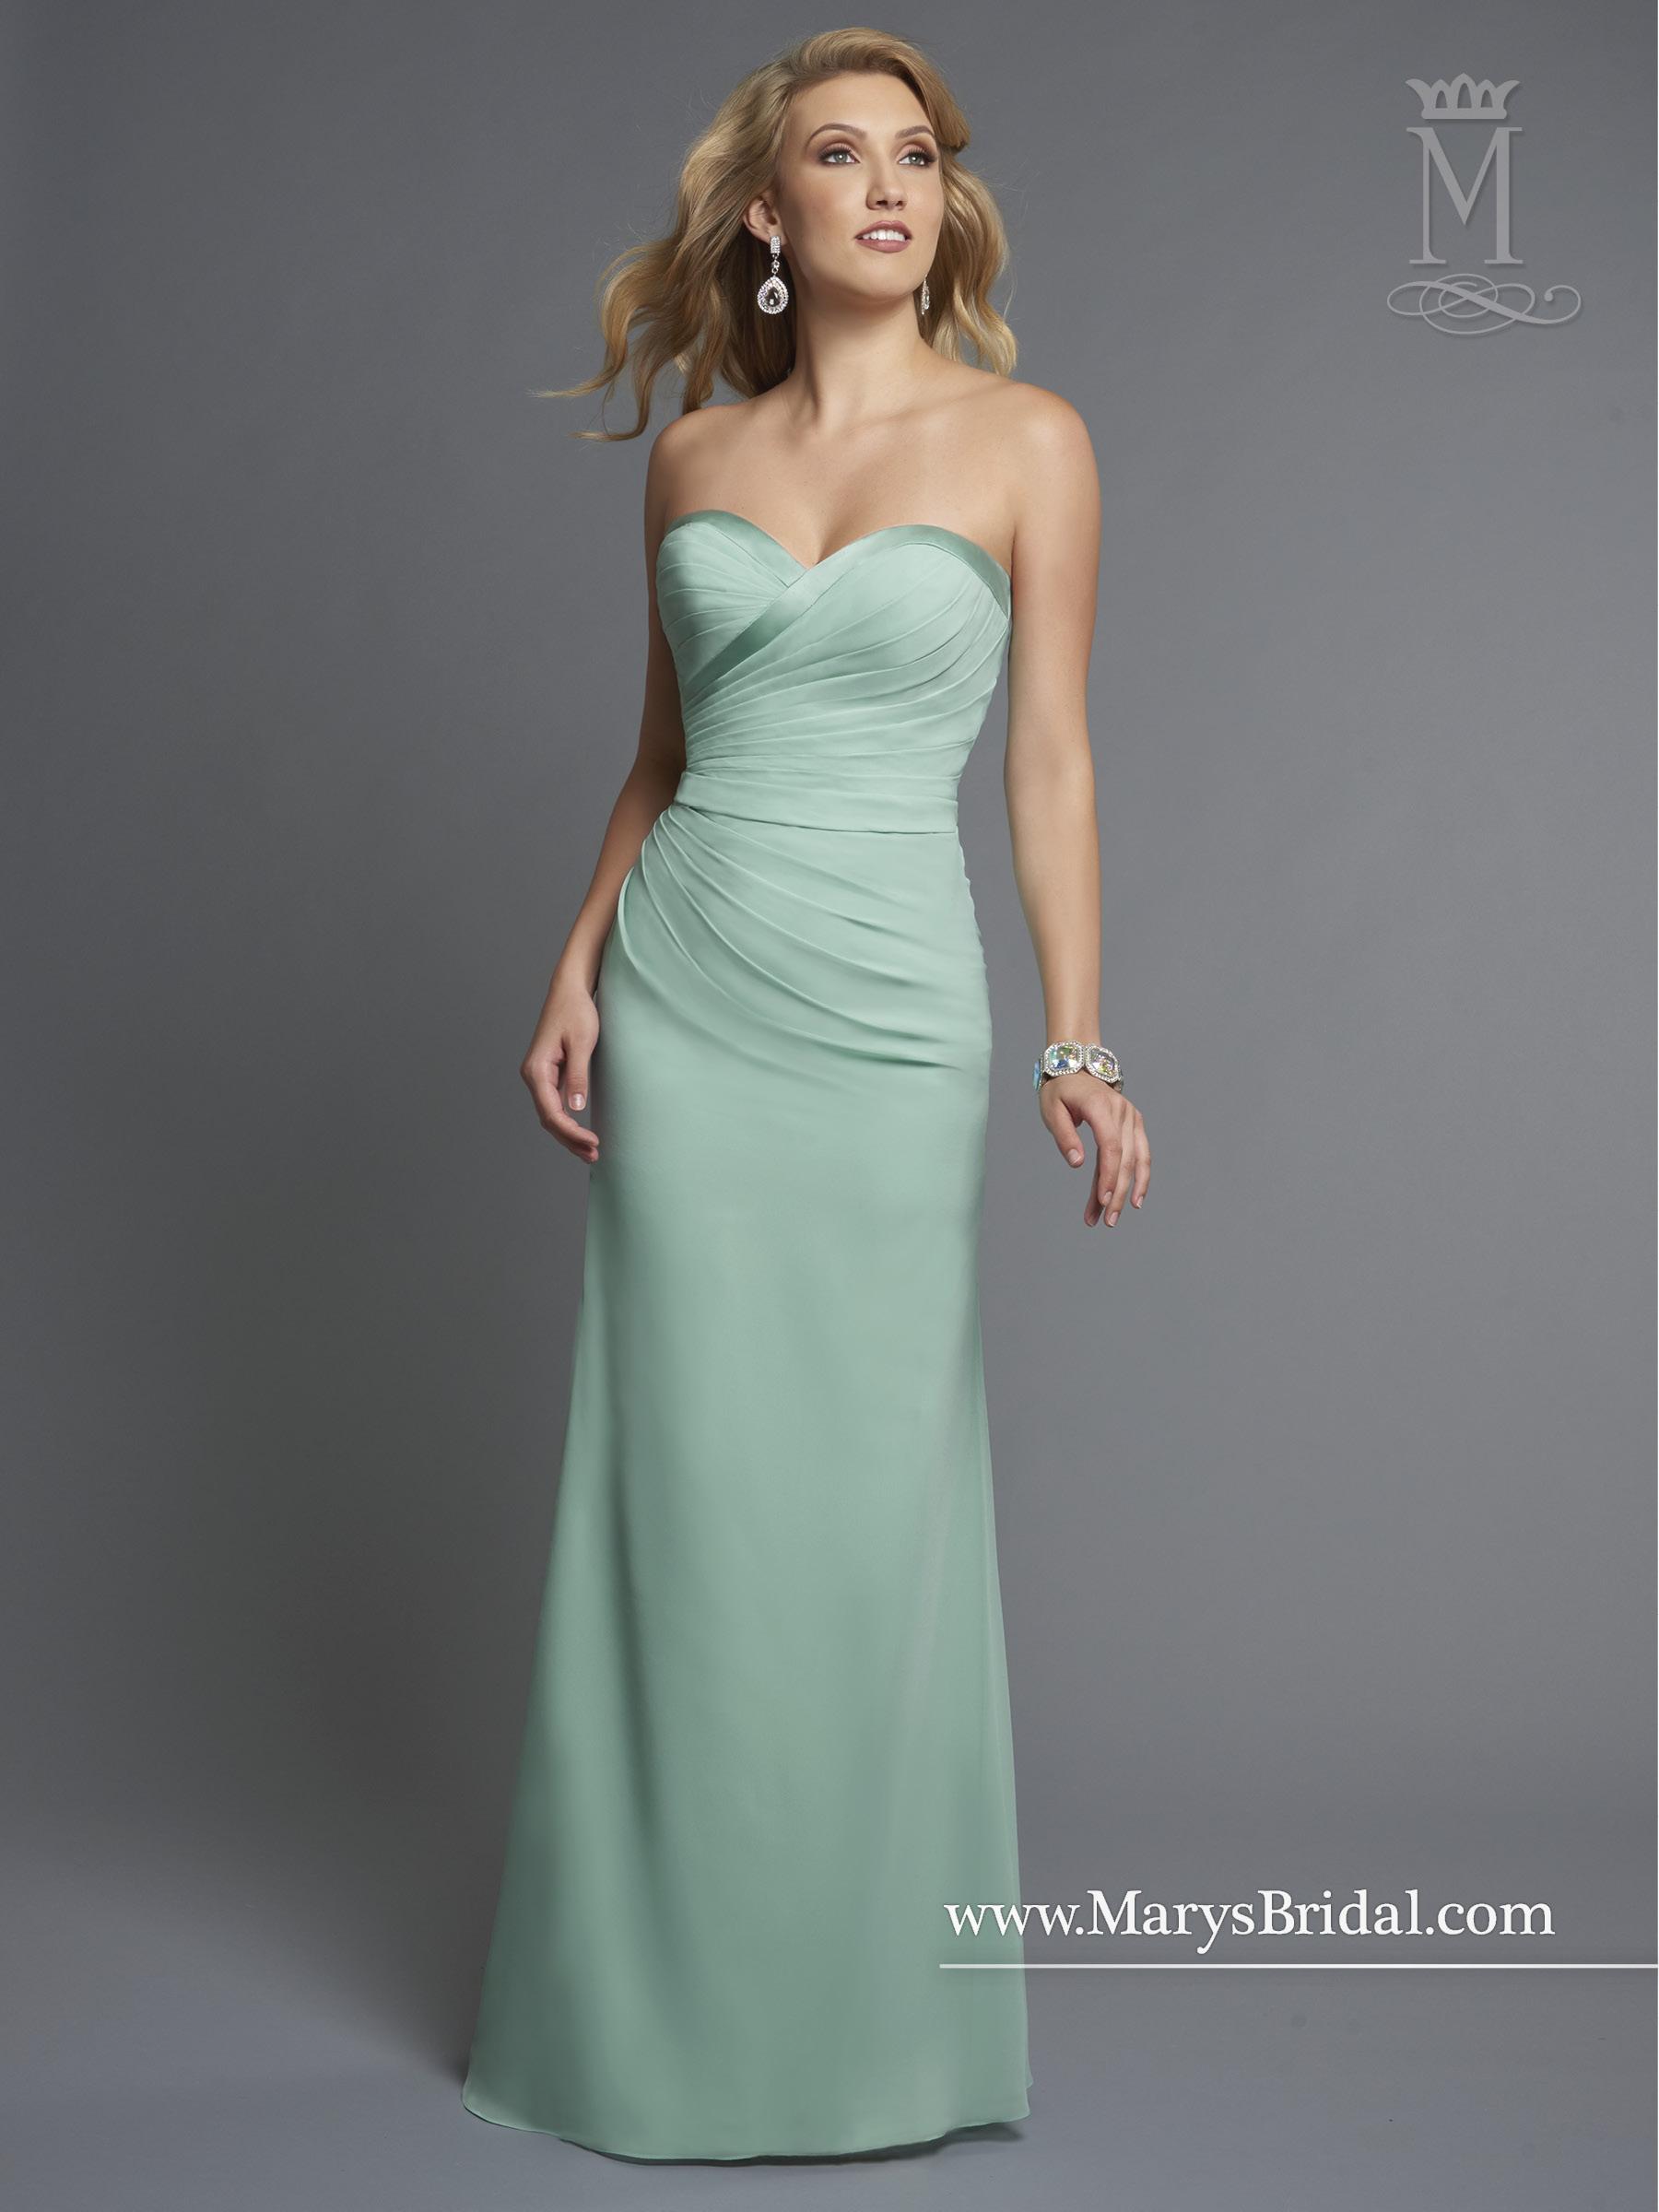 Amalia Bridesmaid Dresses | Style - M1841 in Shown in Seafoam and ...